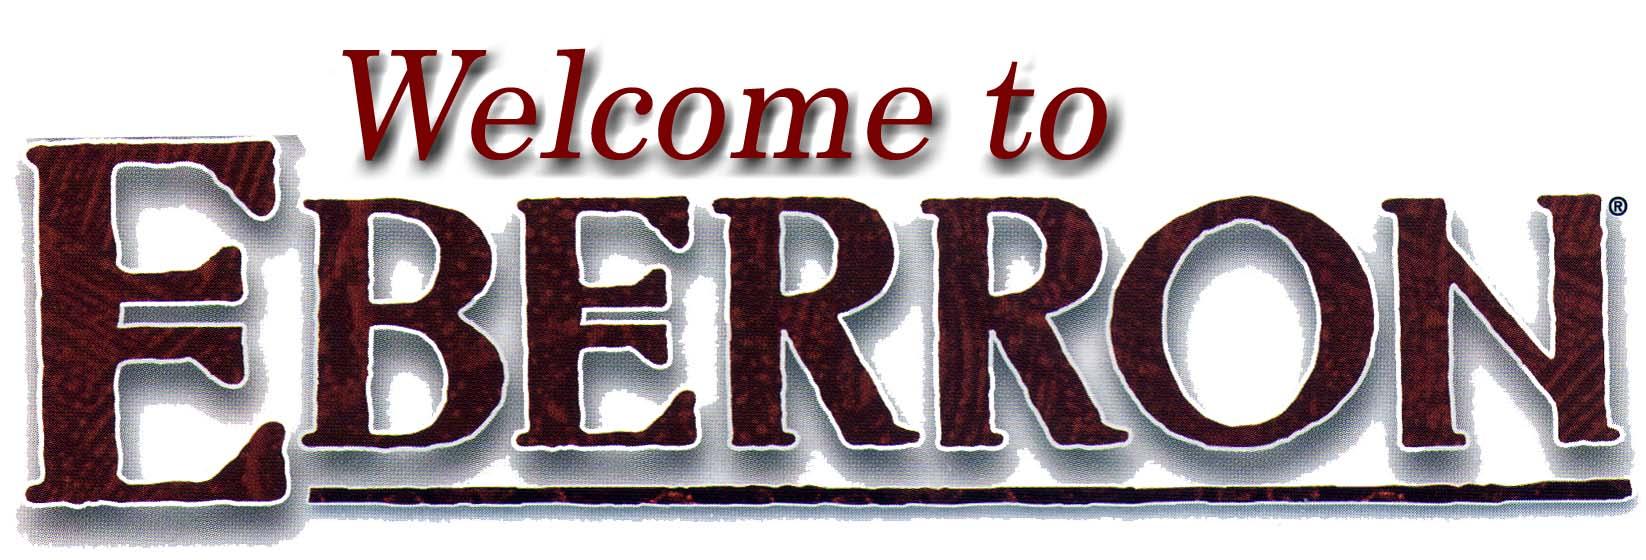 Welcome to eberron